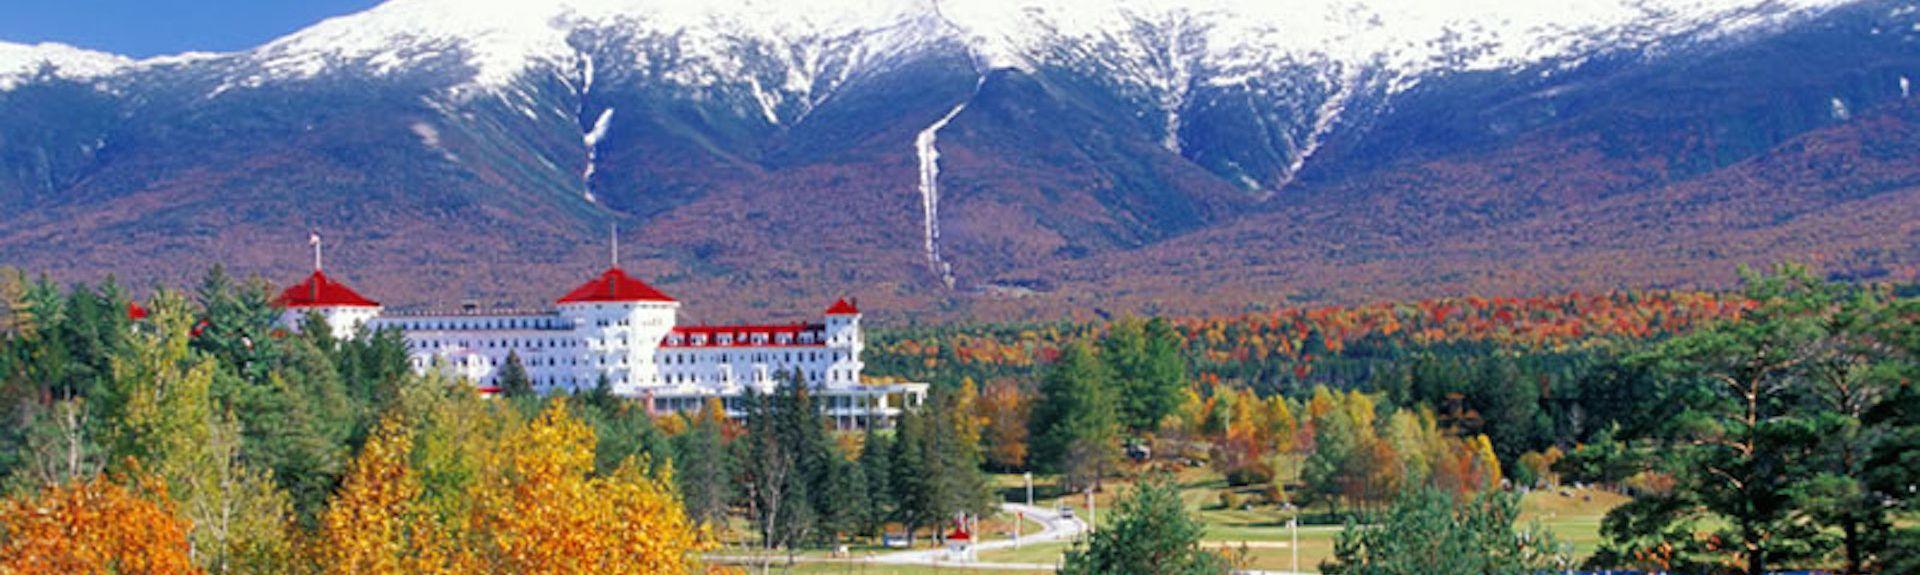 Cannon Mountain Ski Area, Franconia, New Hampshire, Estados Unidos